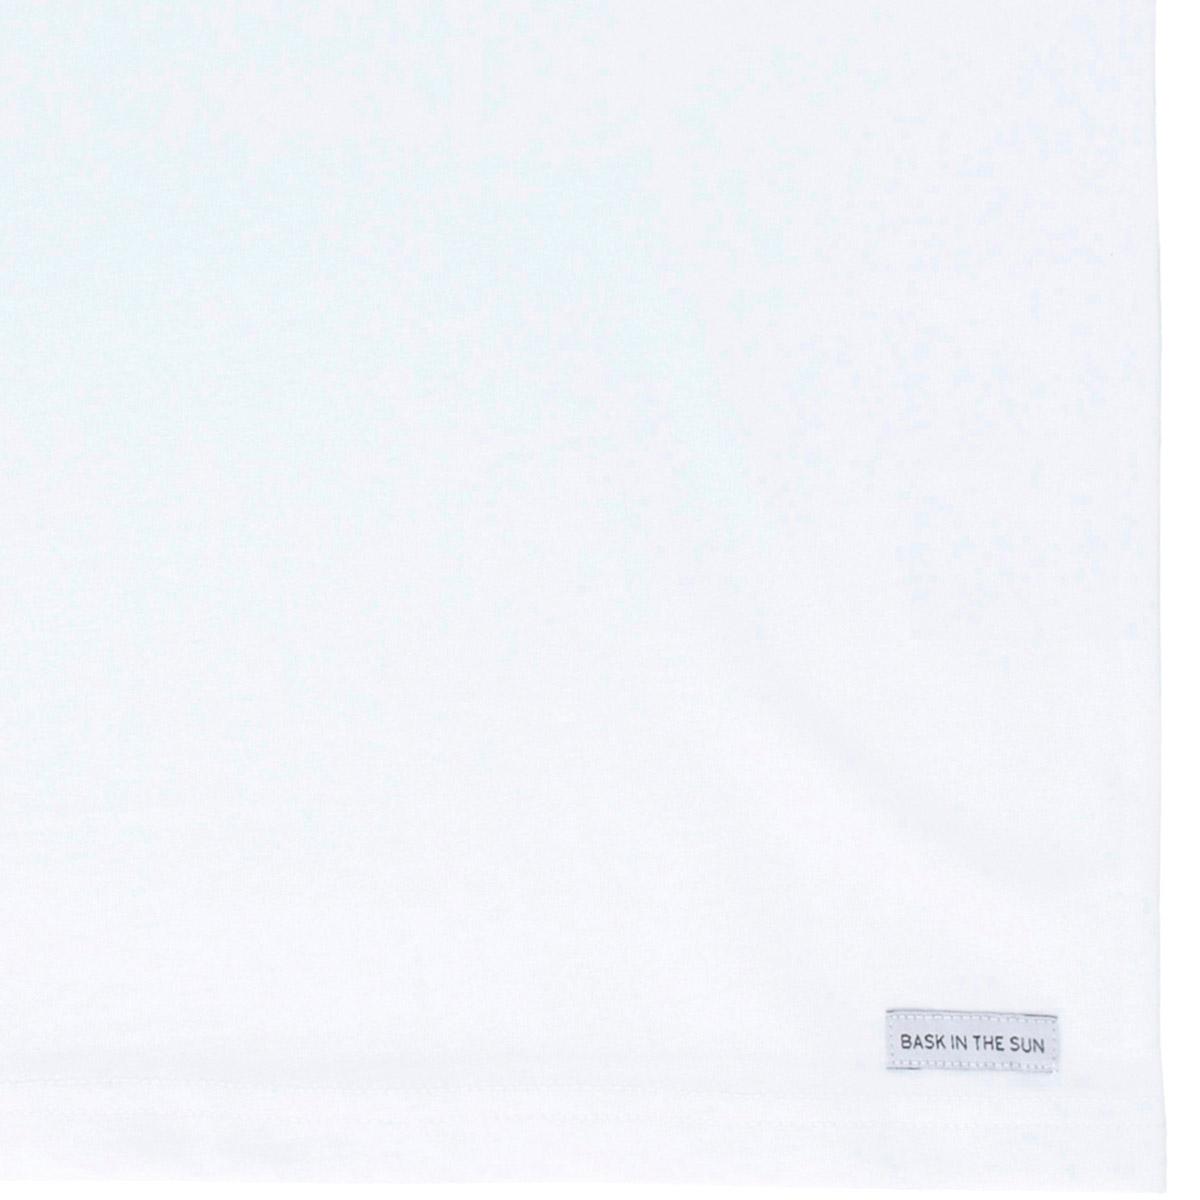 T-shirt en coton bio white seagull - Bask in the Sun num 2